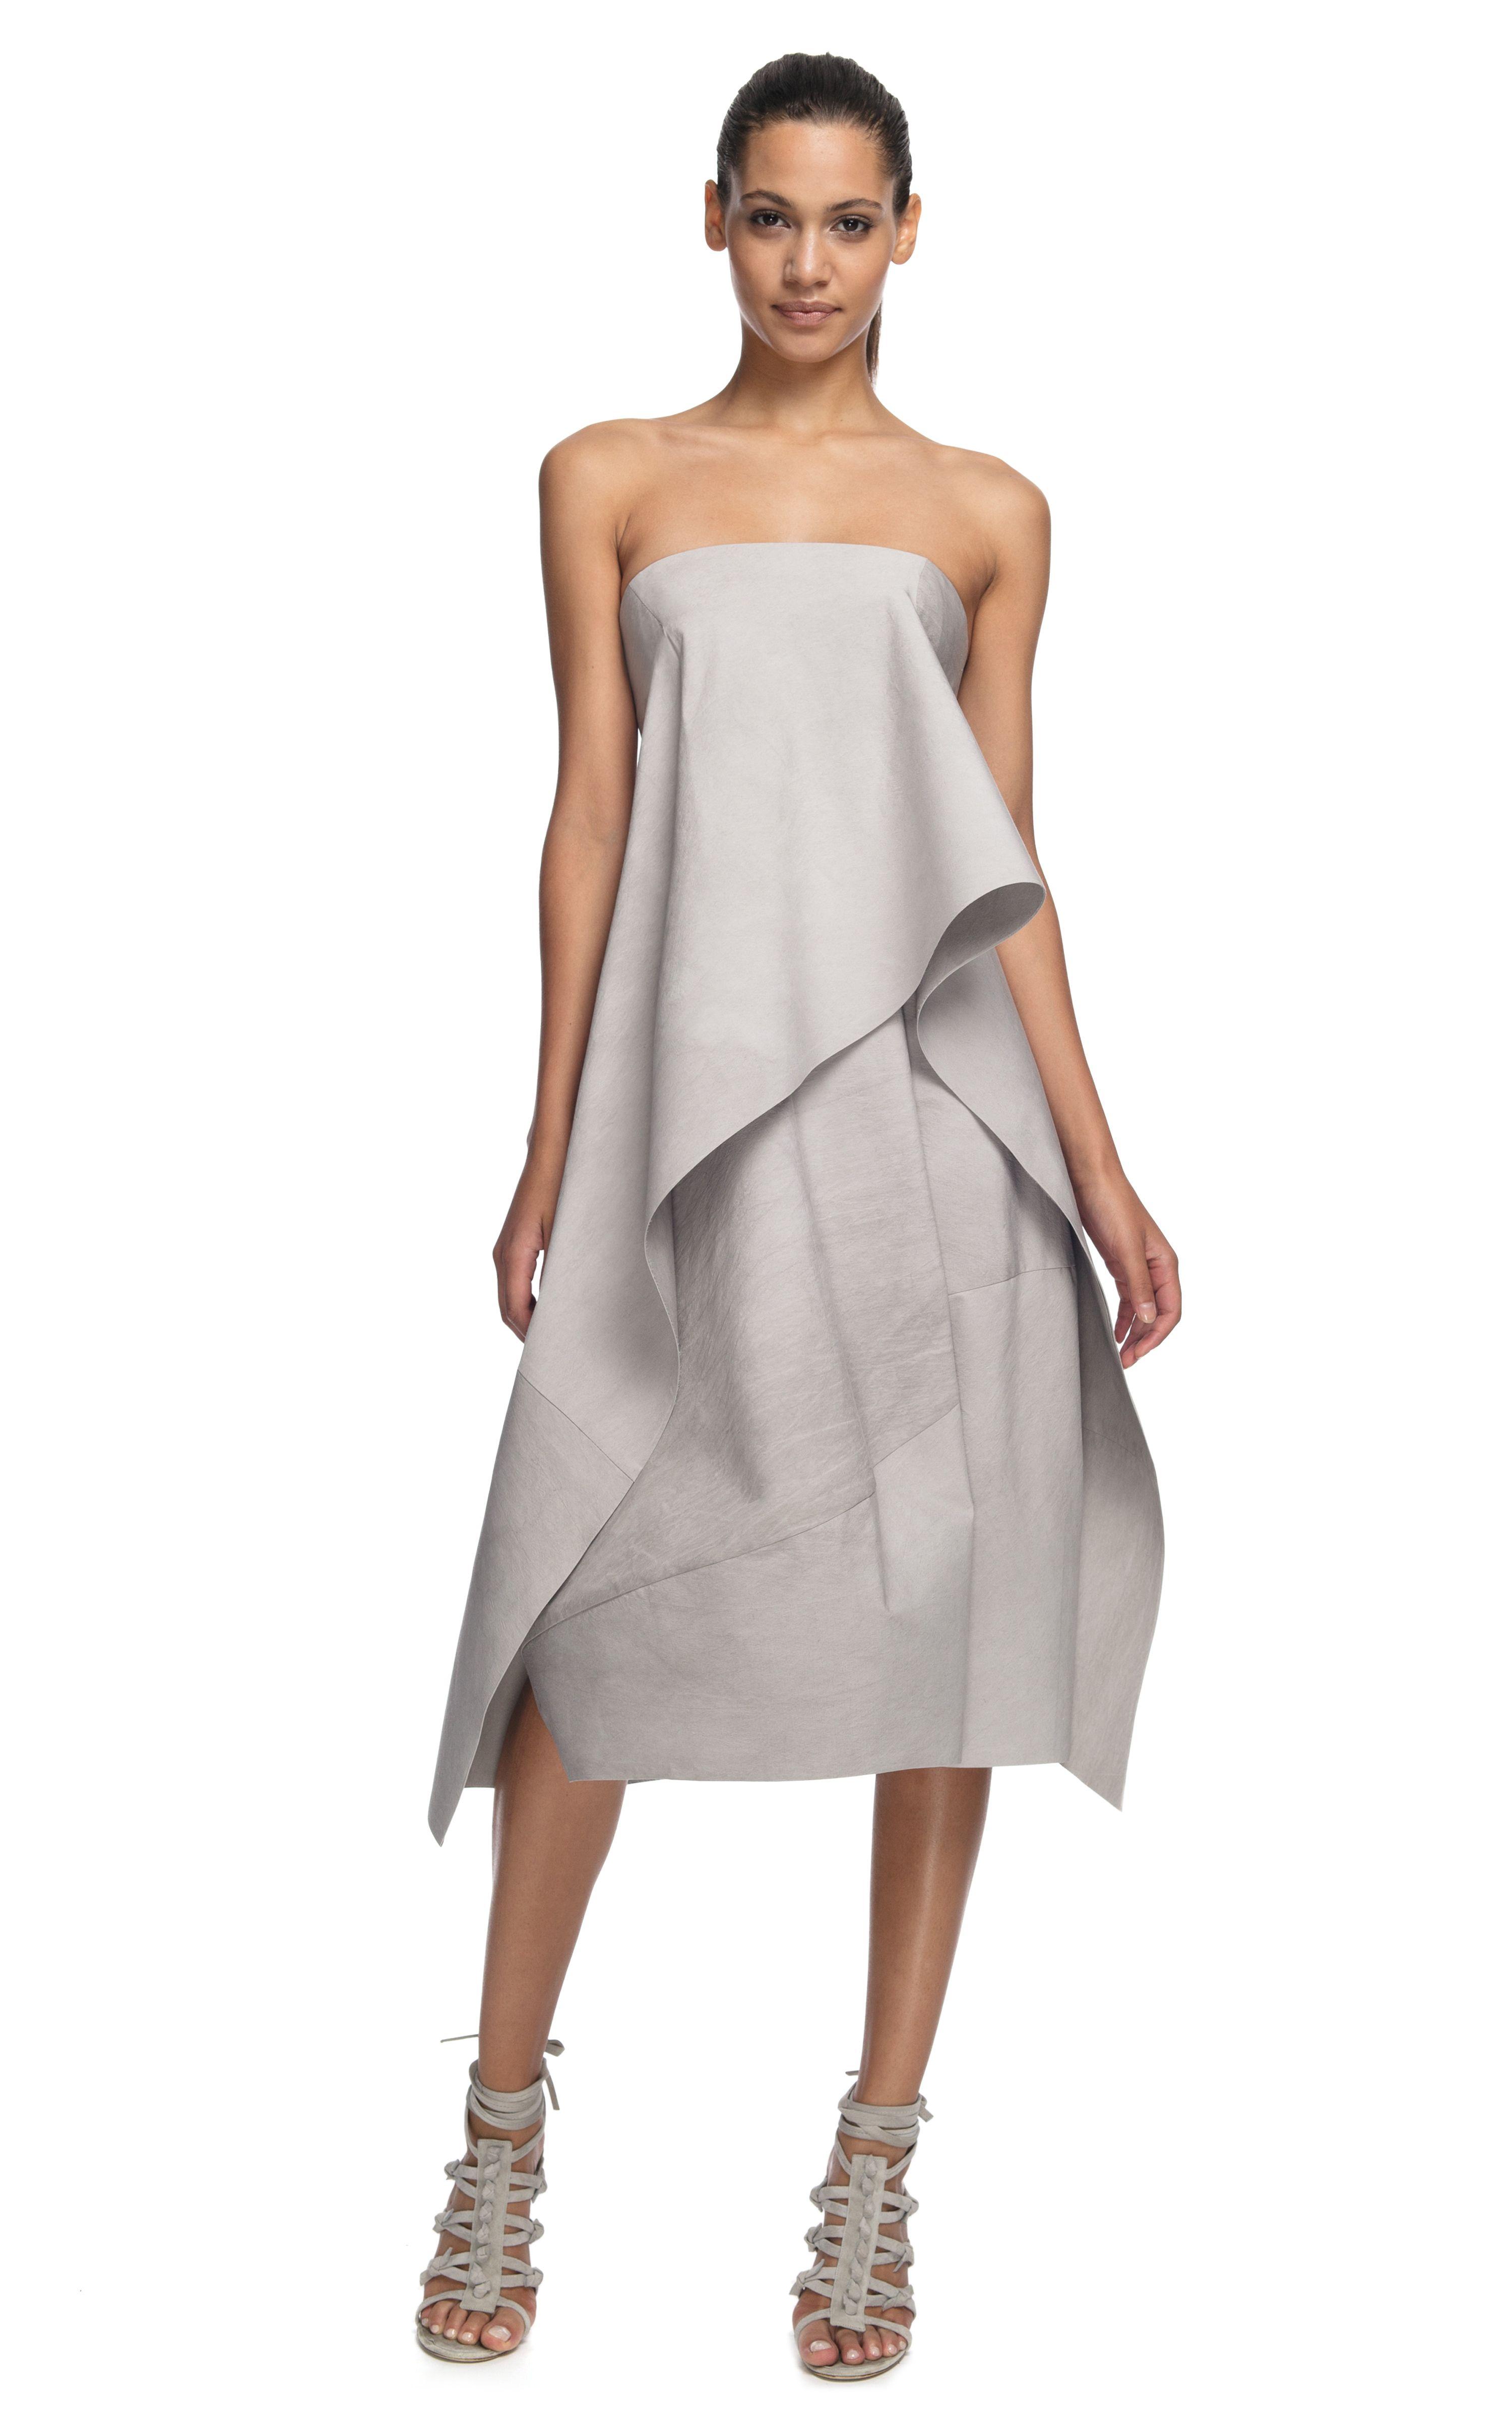 c0a8e544b78 Donna Karan - lovely strapless origami dress